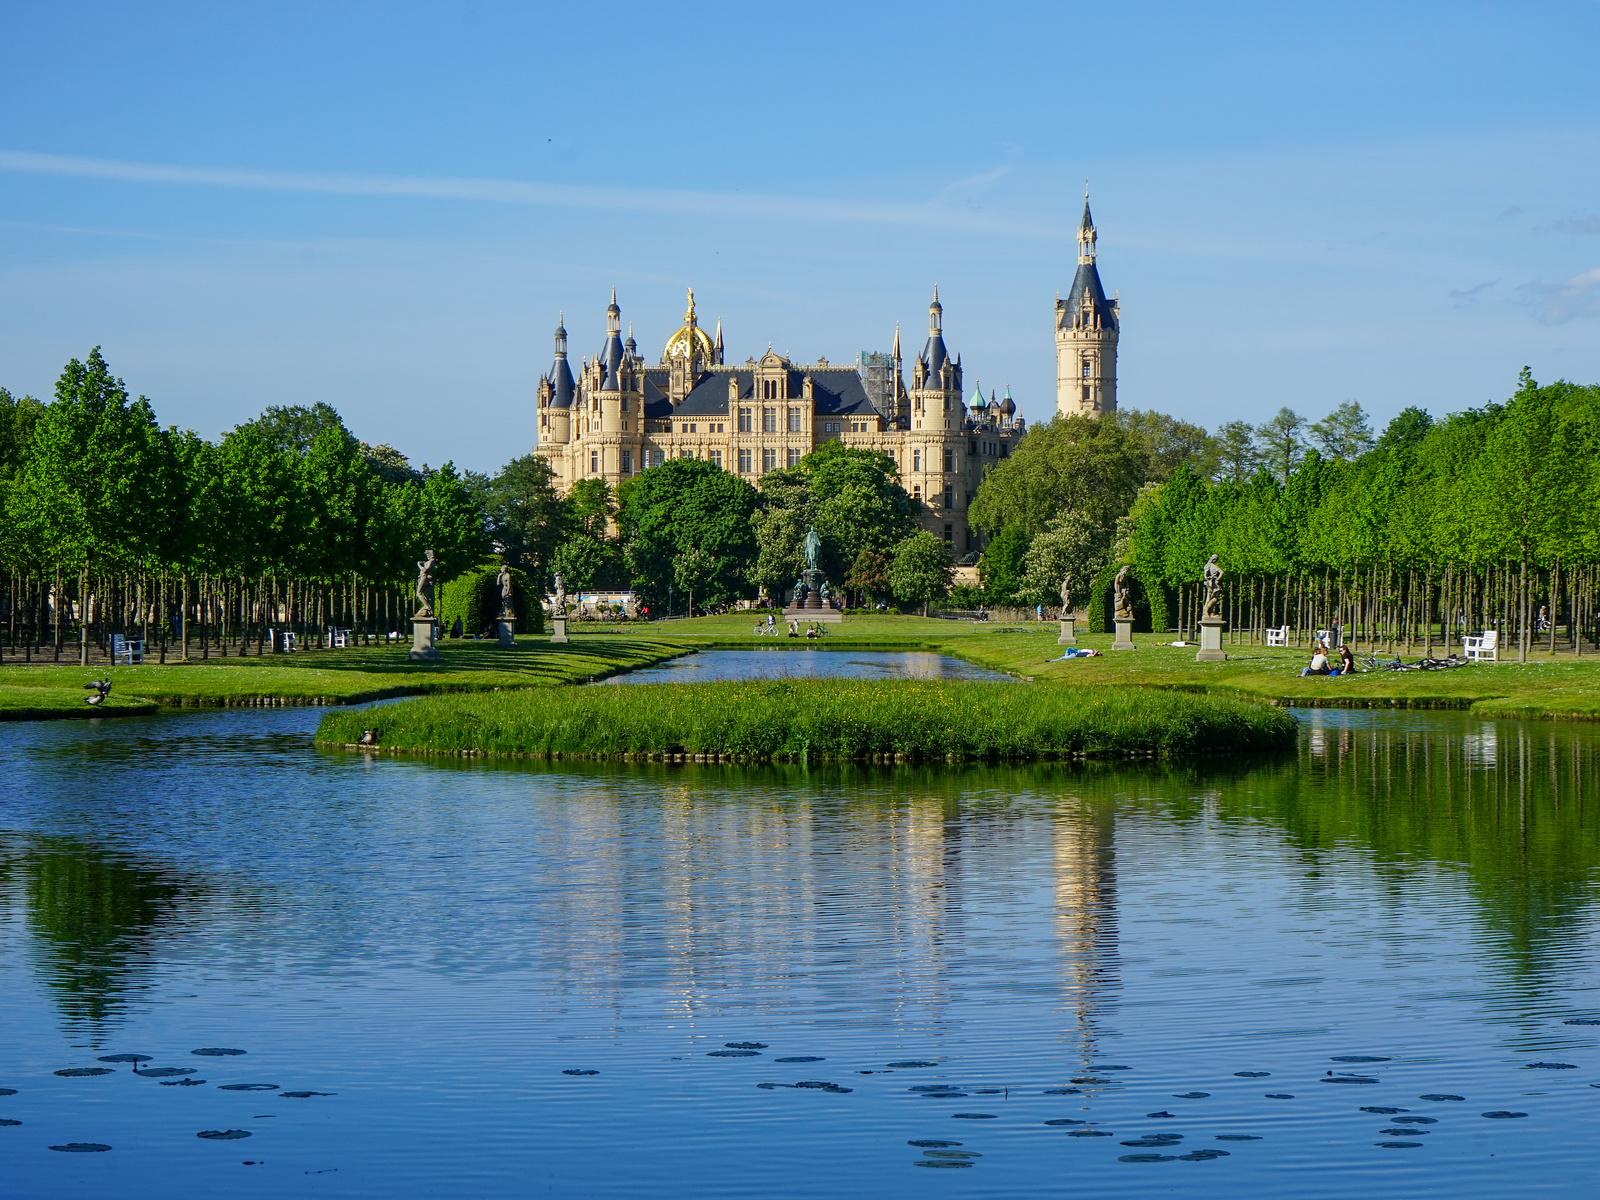 германия, замок, пруд, schwerin castle, mecklenburg-vorpommern, башня, деревья, город